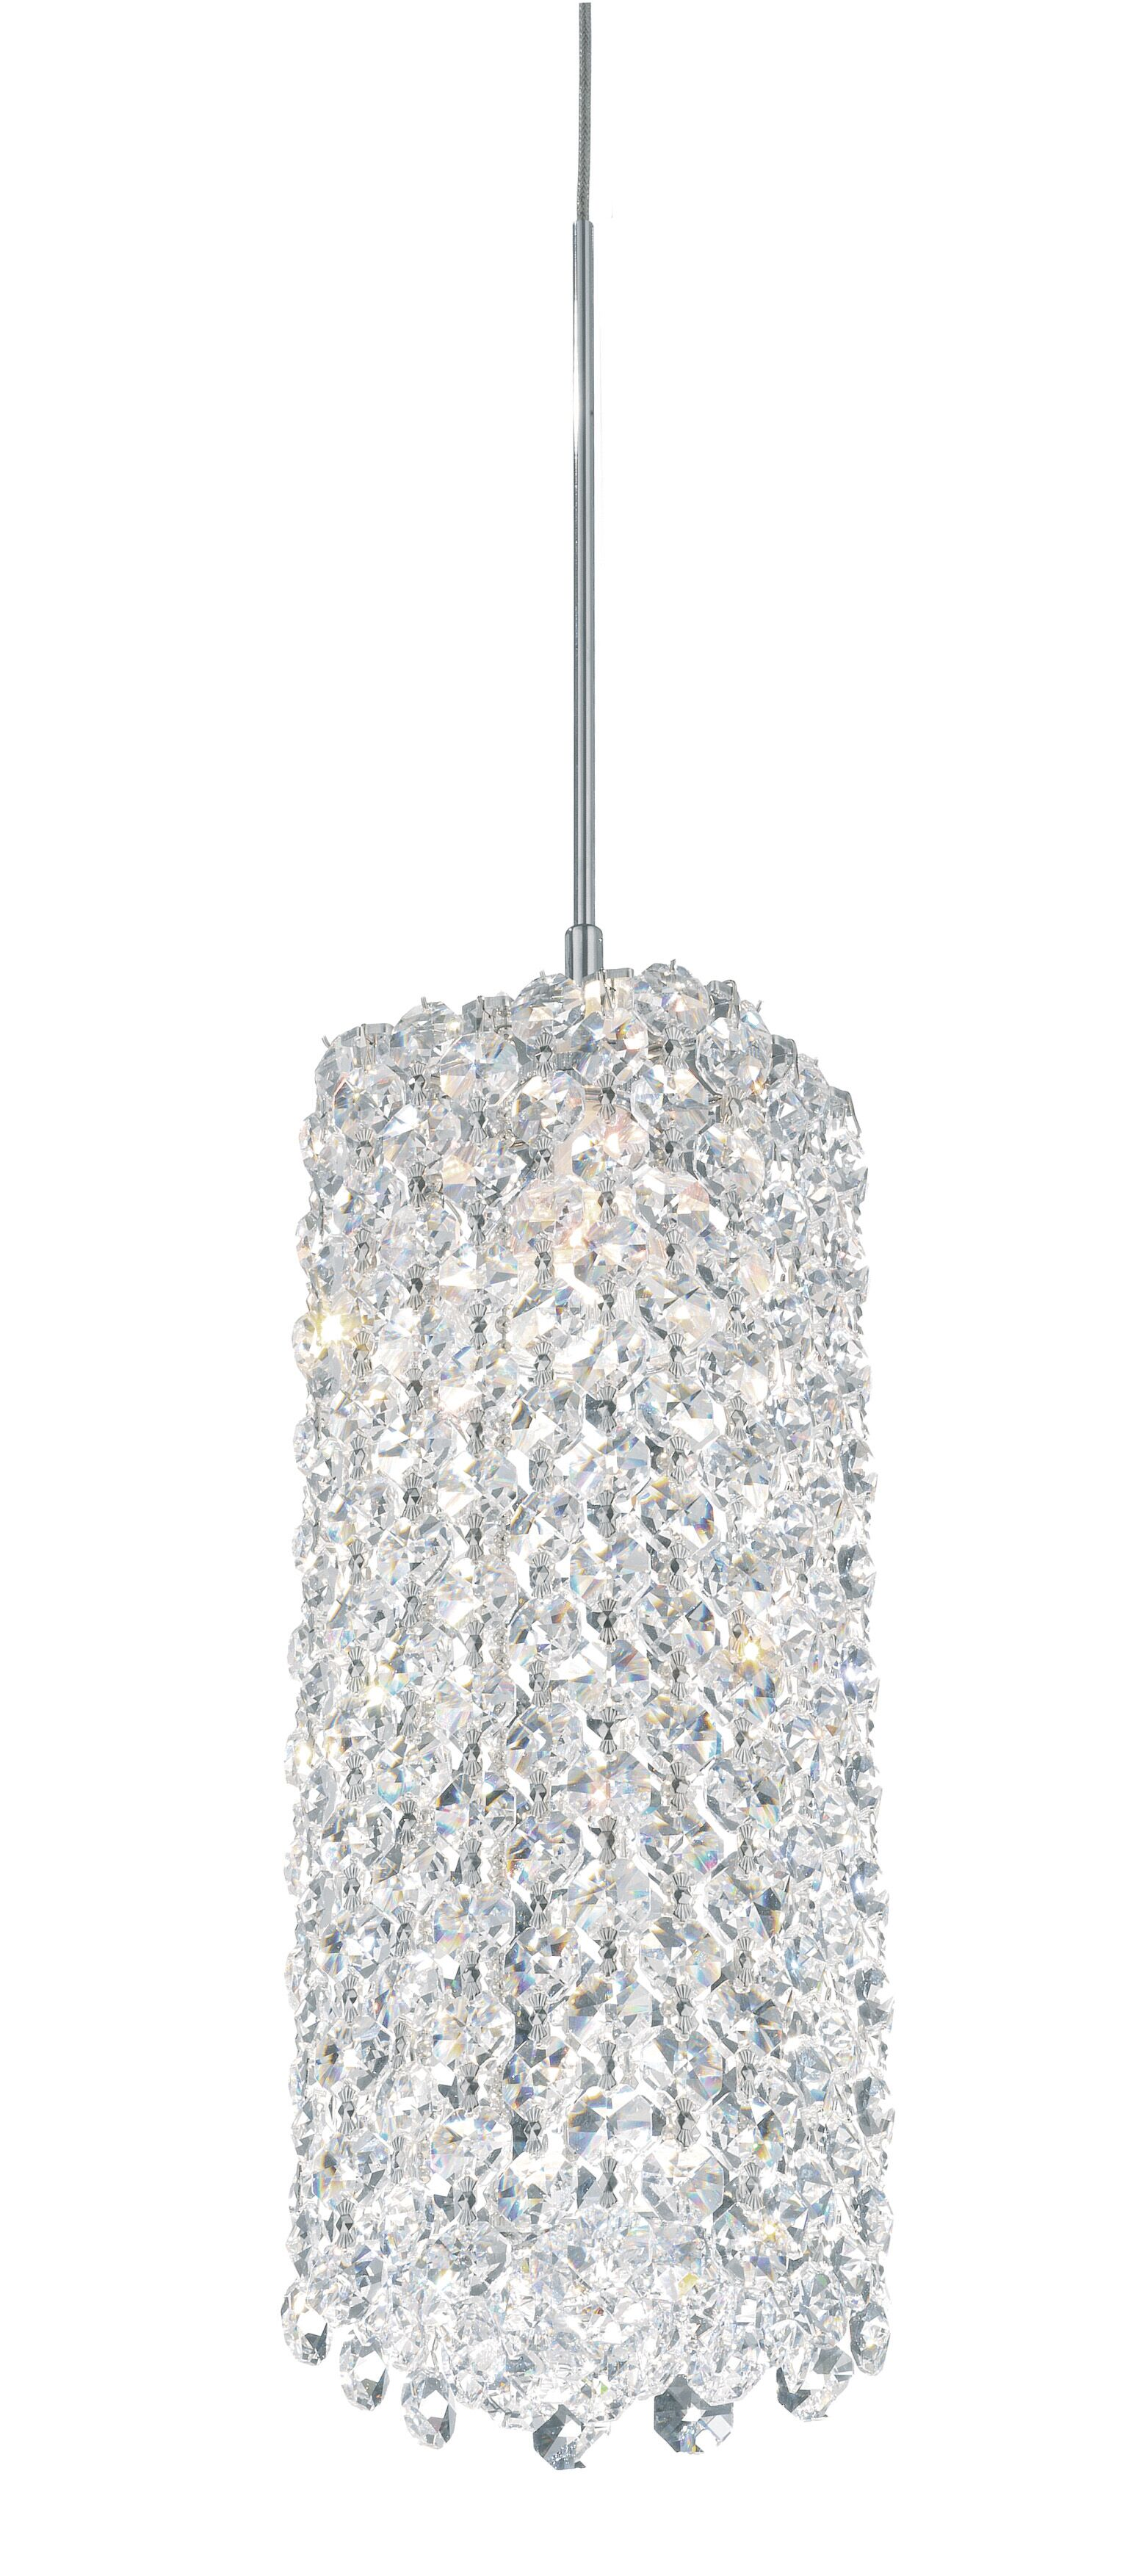 Refrax 1-Light Crystal Pendant Crystal Type: Swarovski Elements Bullet